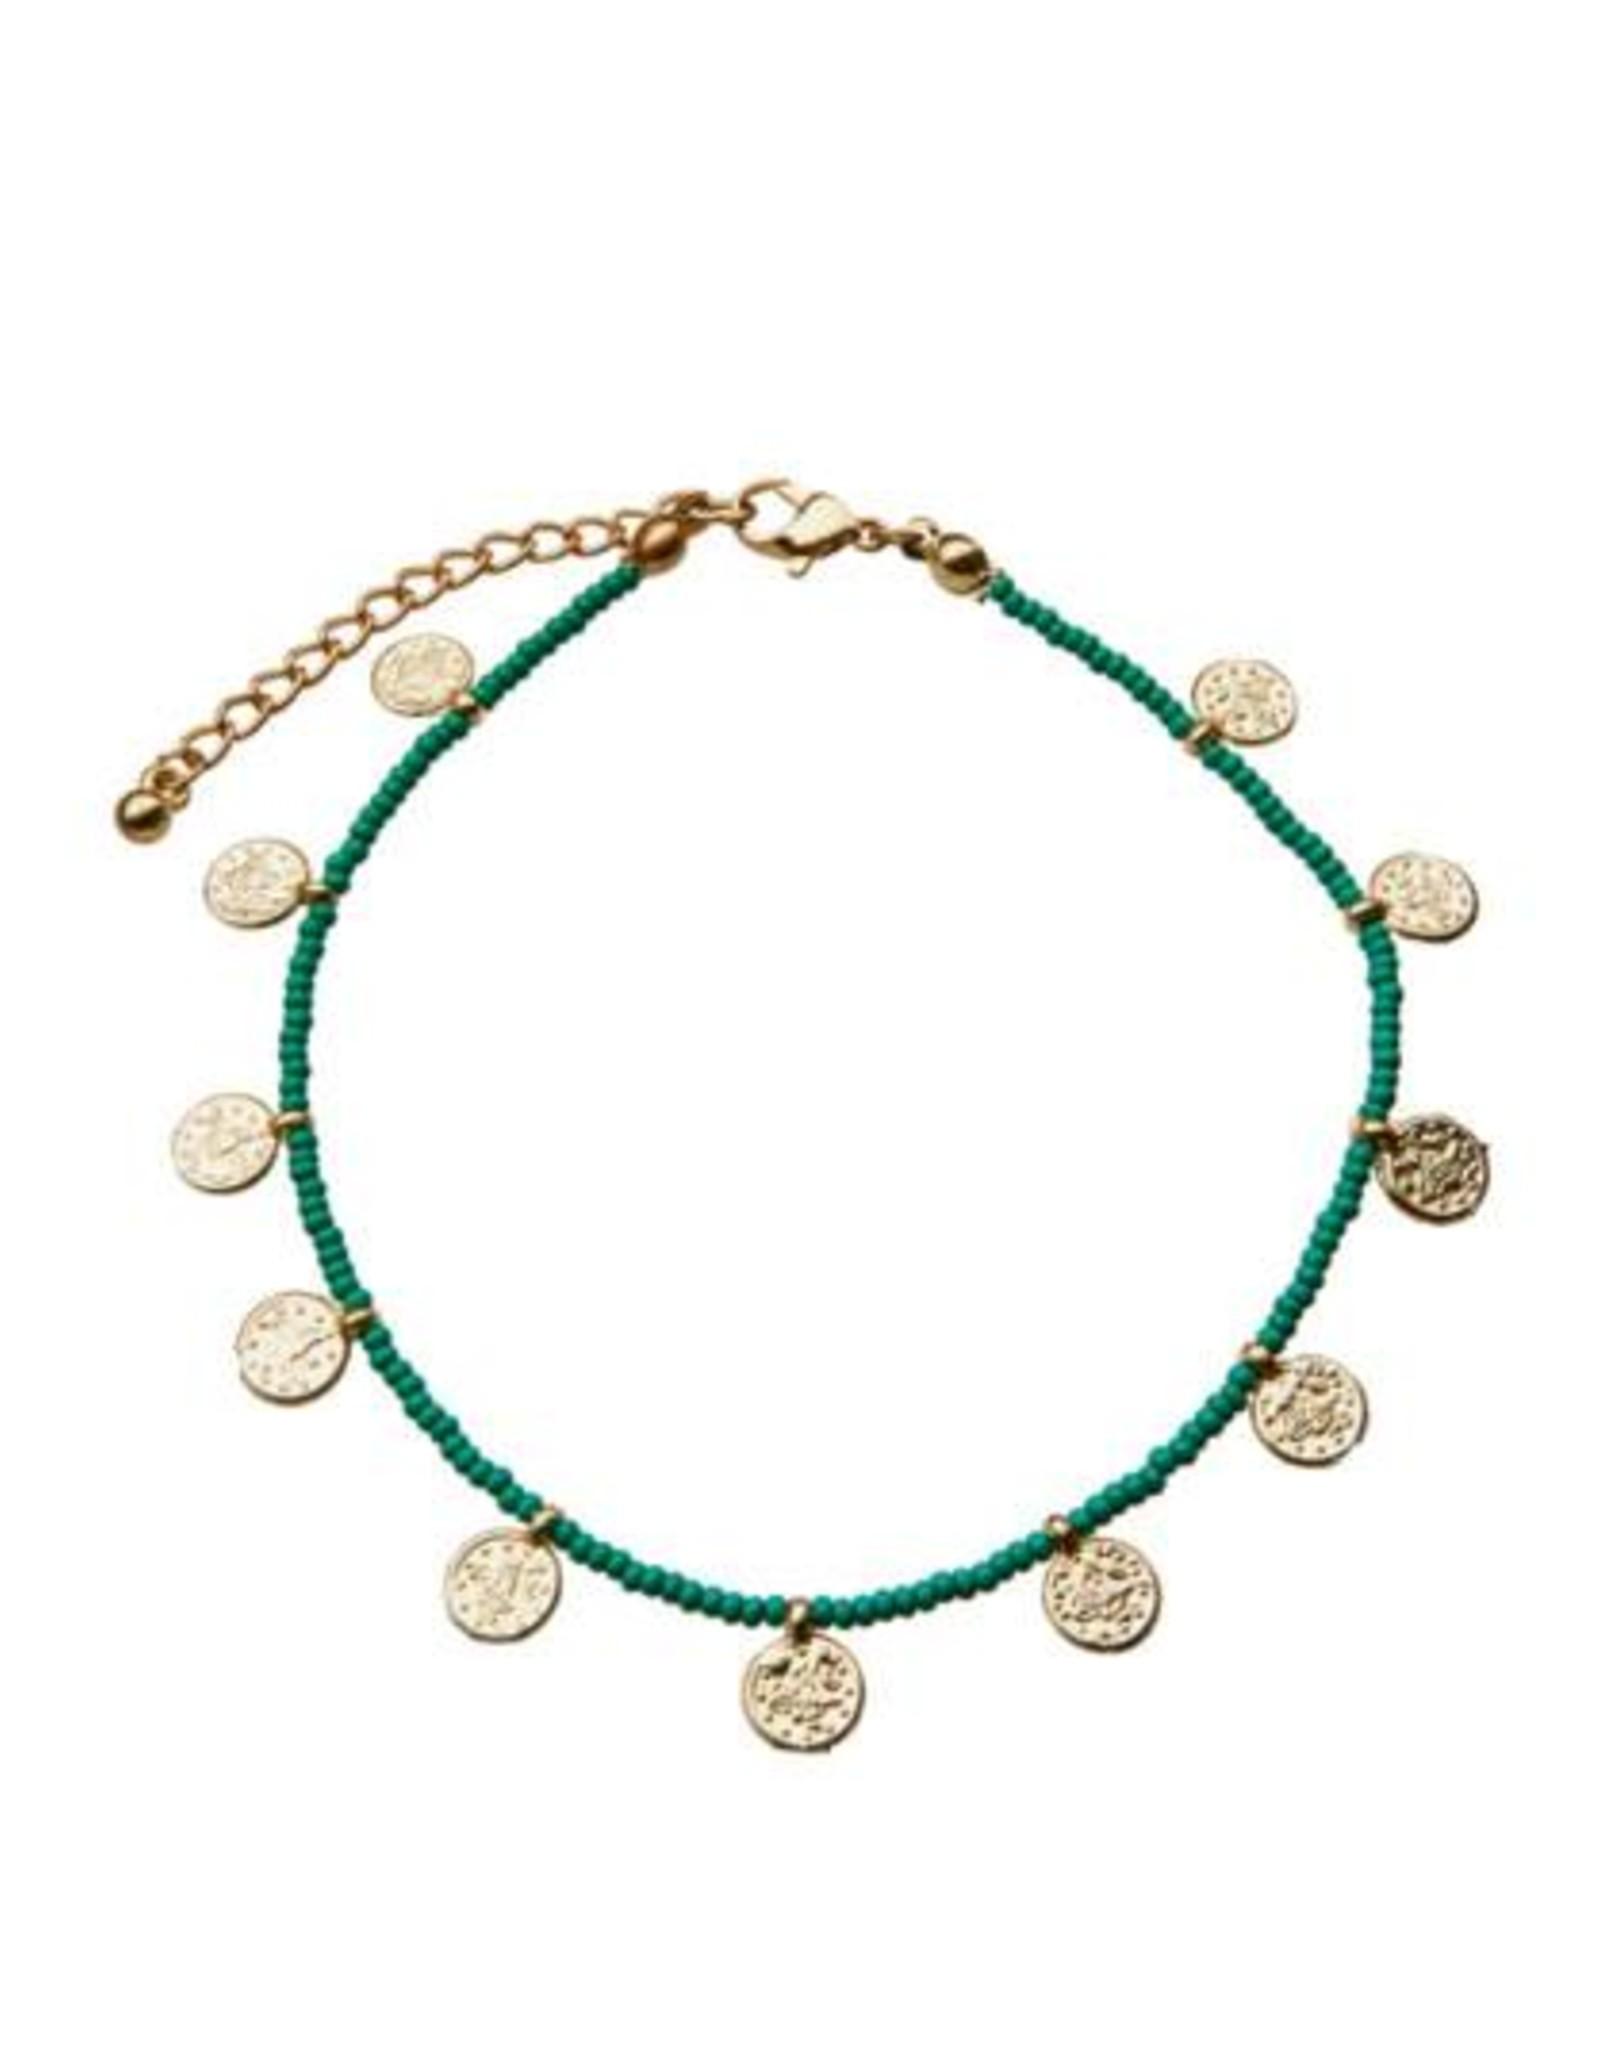 Bulu Bulu golden coins anklet green